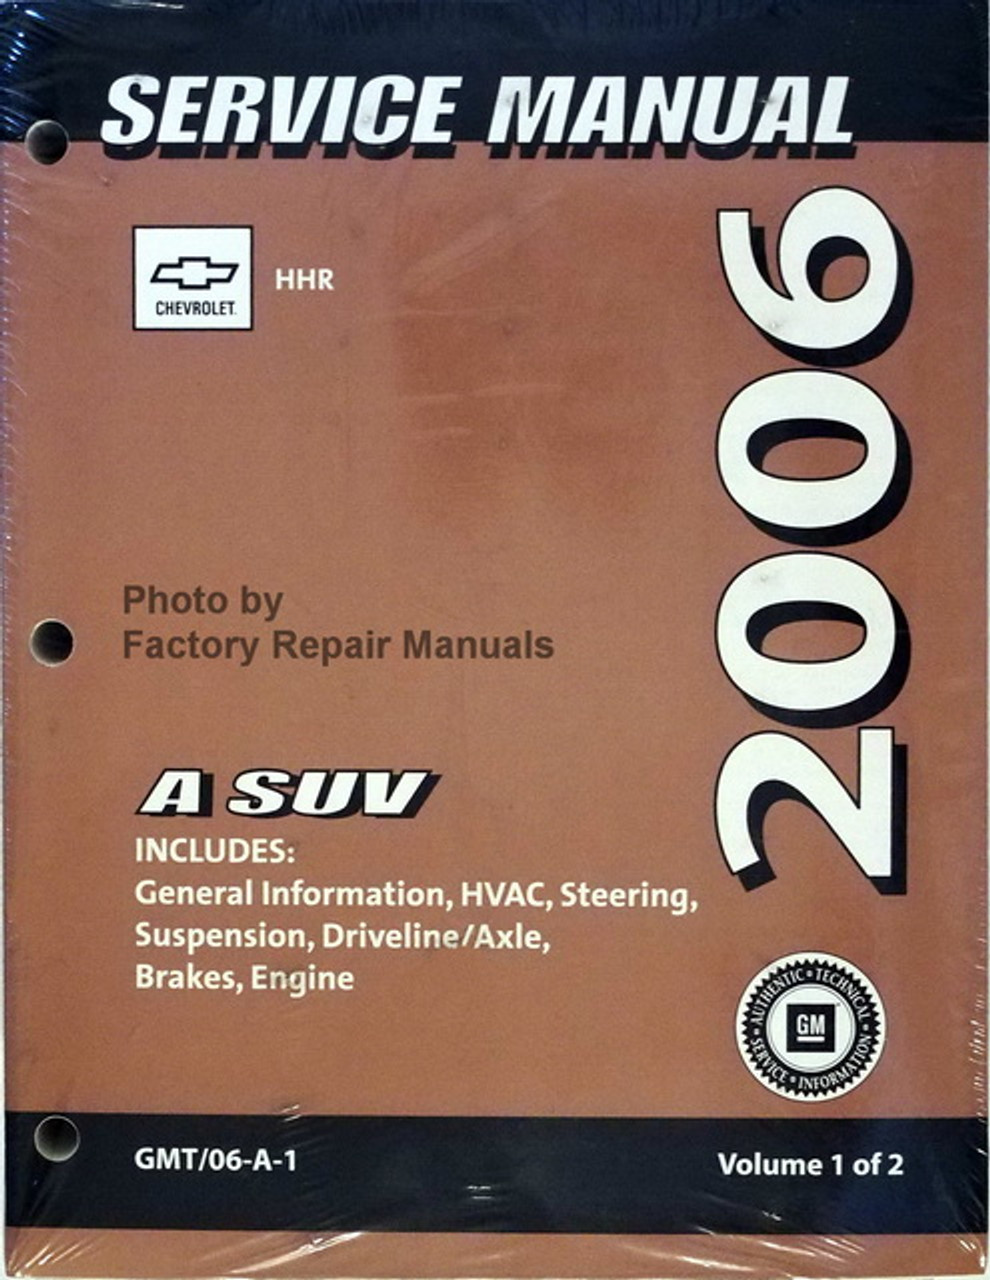 2006 Chevrolet Hhr Factory Service Manual Original Shop Repair Set